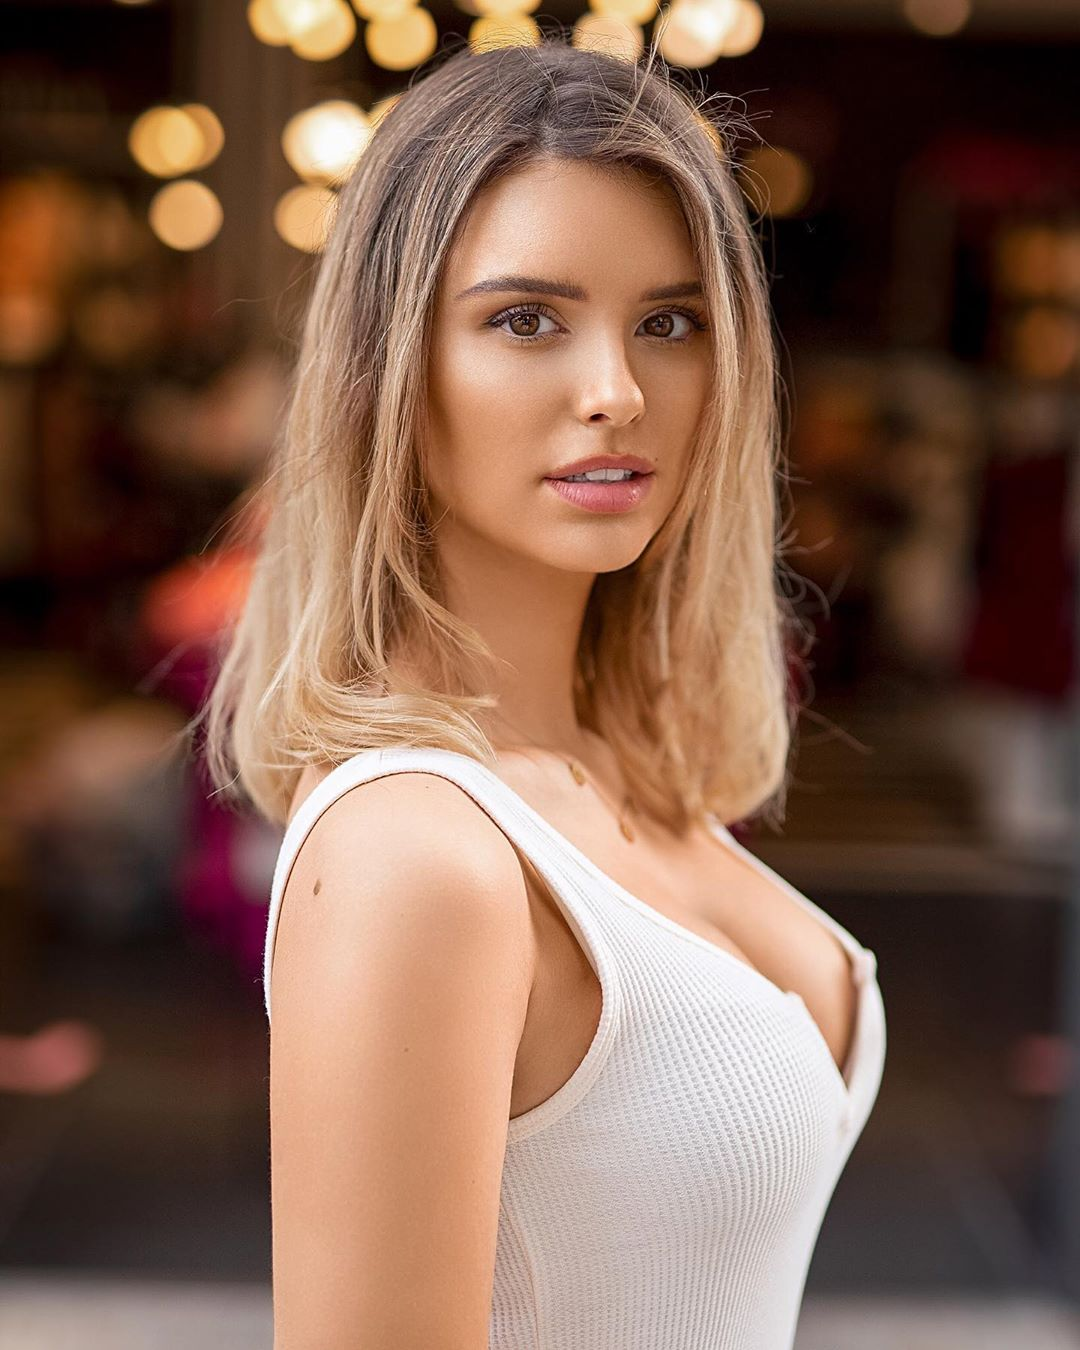 Chiara Marie